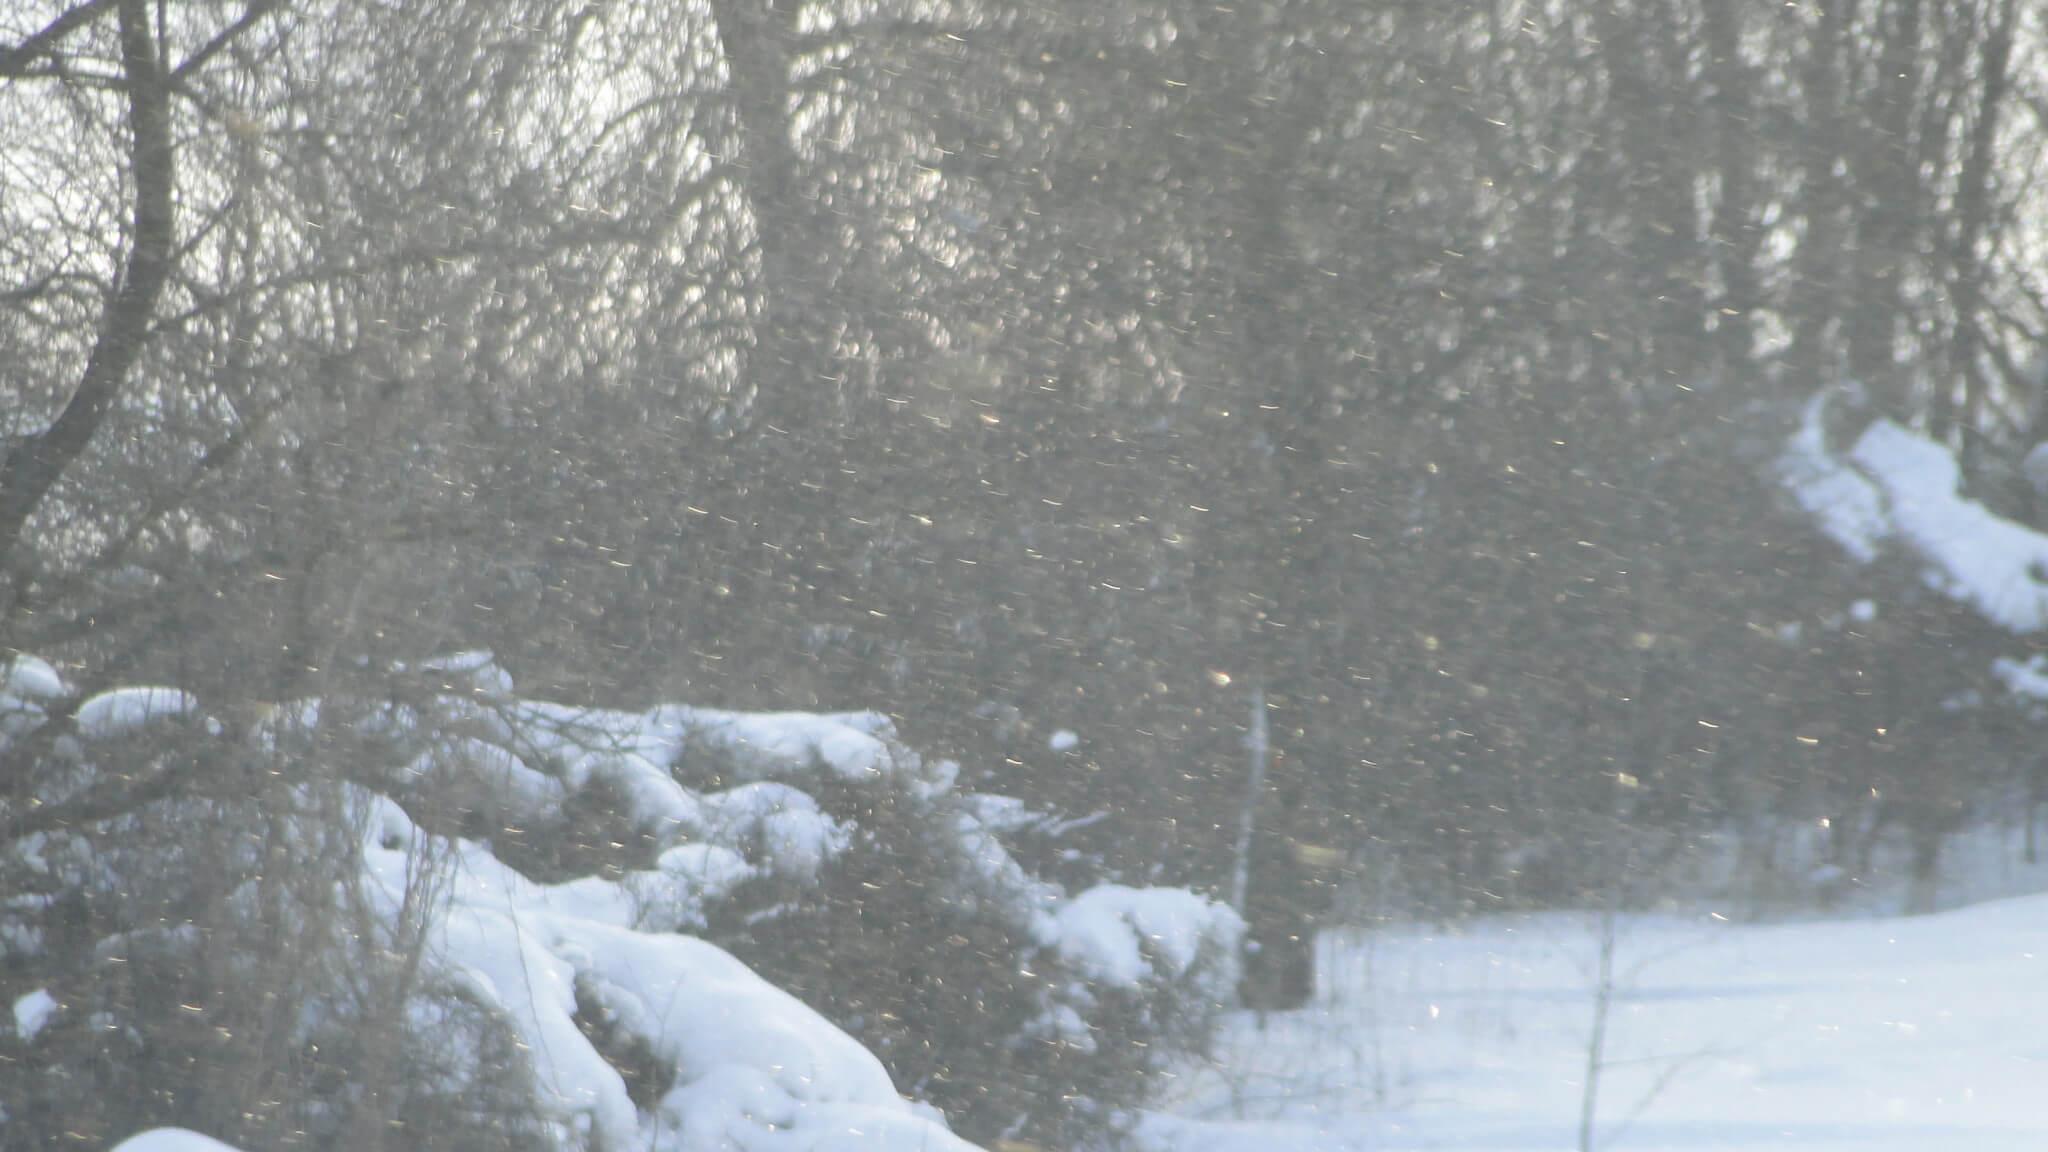 Lutowa zima - śnieżna i mroźna 27